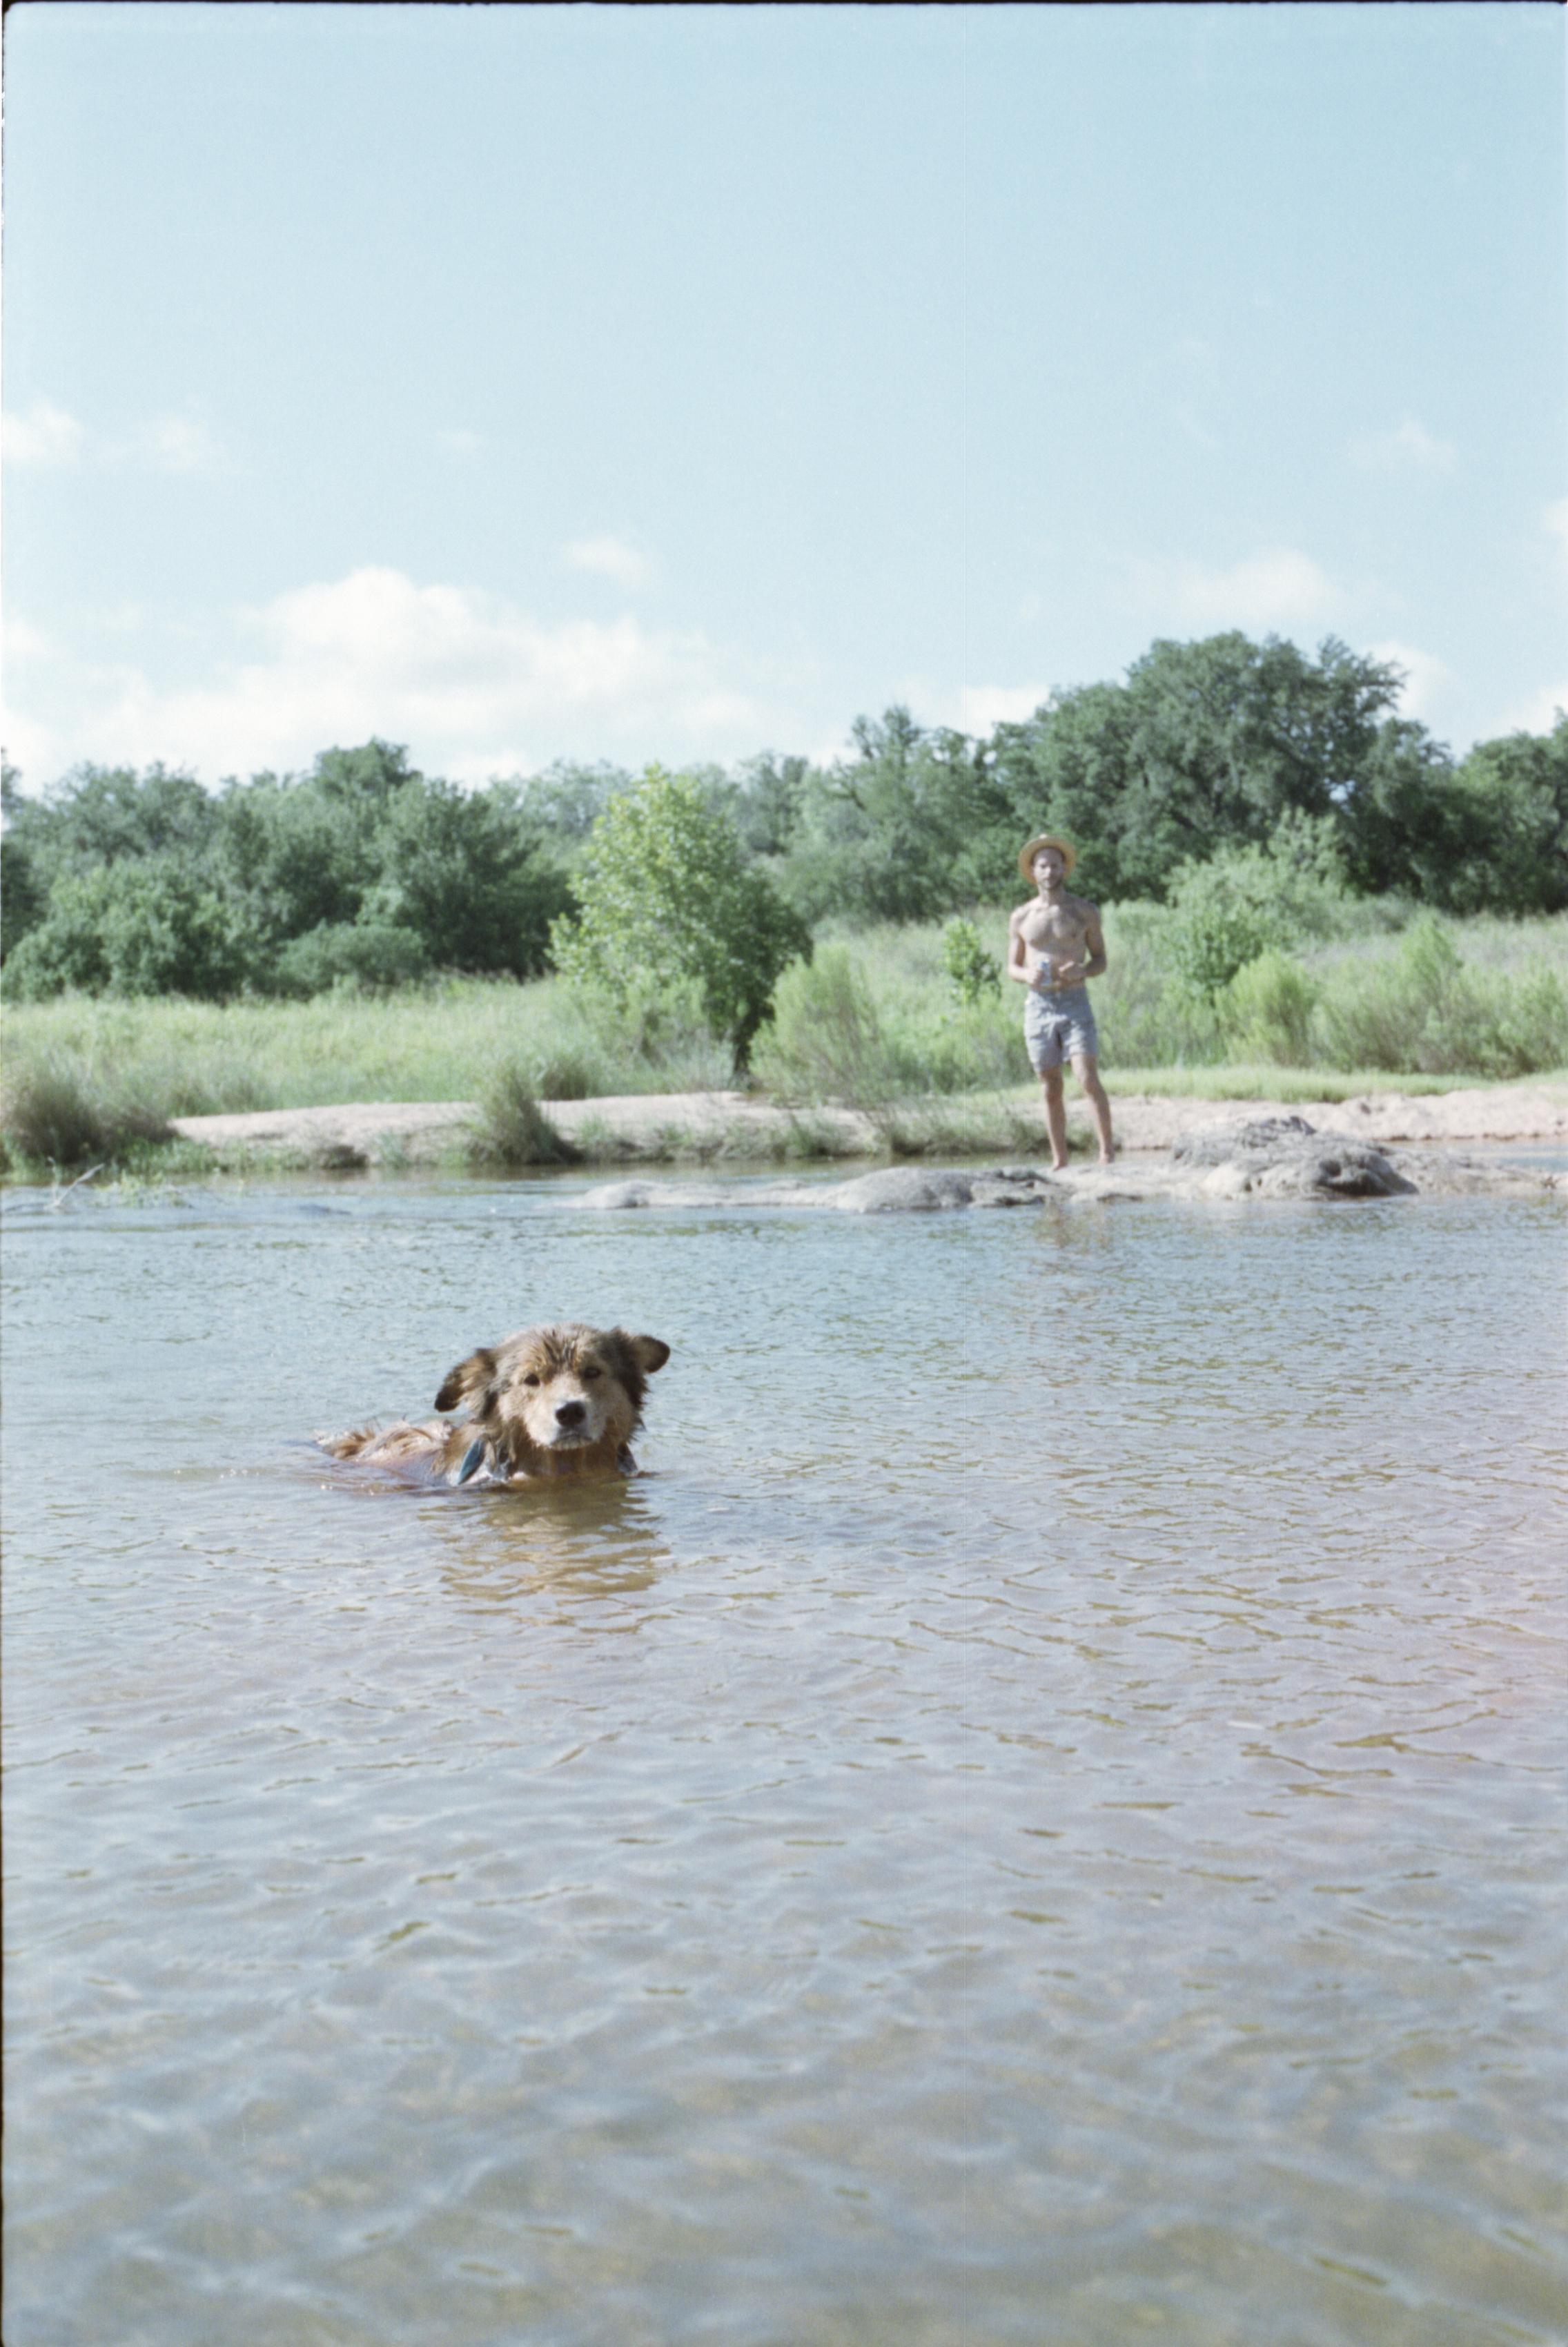 llano river texas camping swim swimming film 35mm pawlowski america yall whatley dog